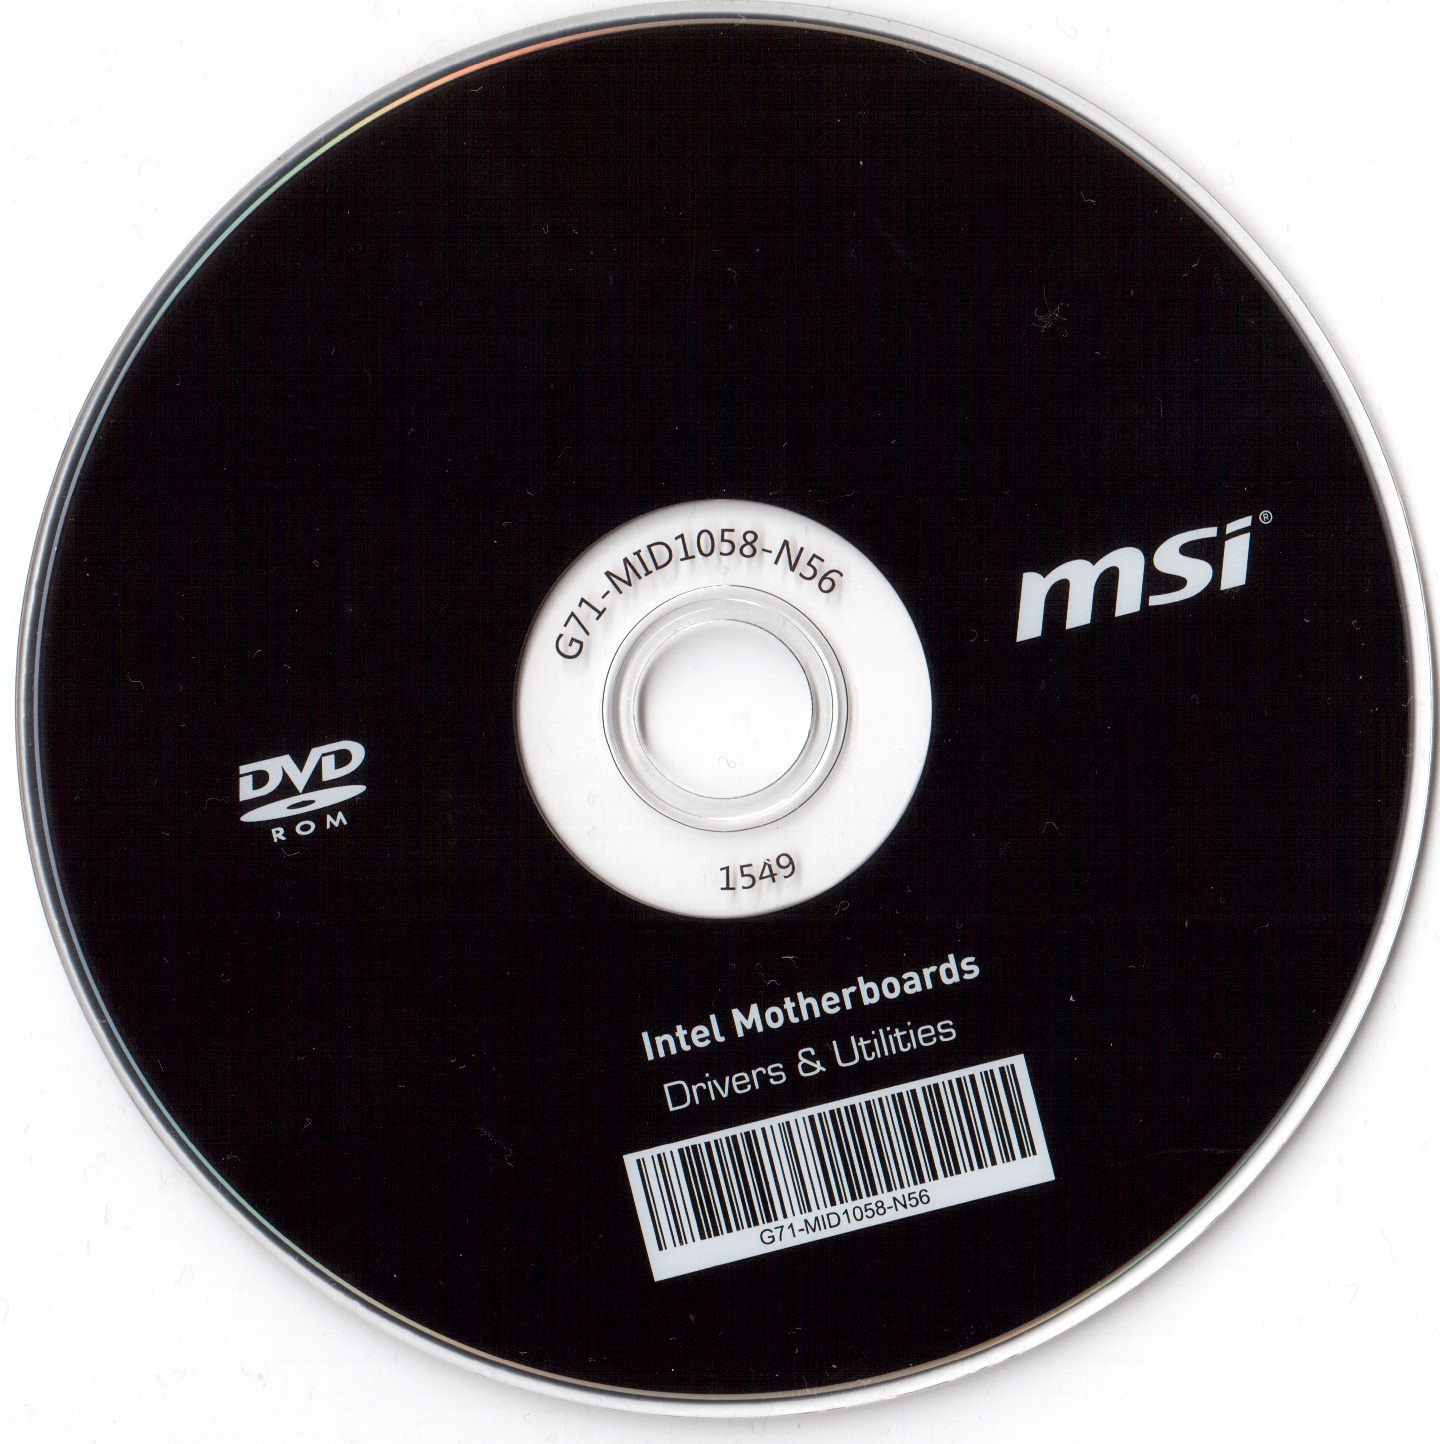 Msi dvd rom Driver download